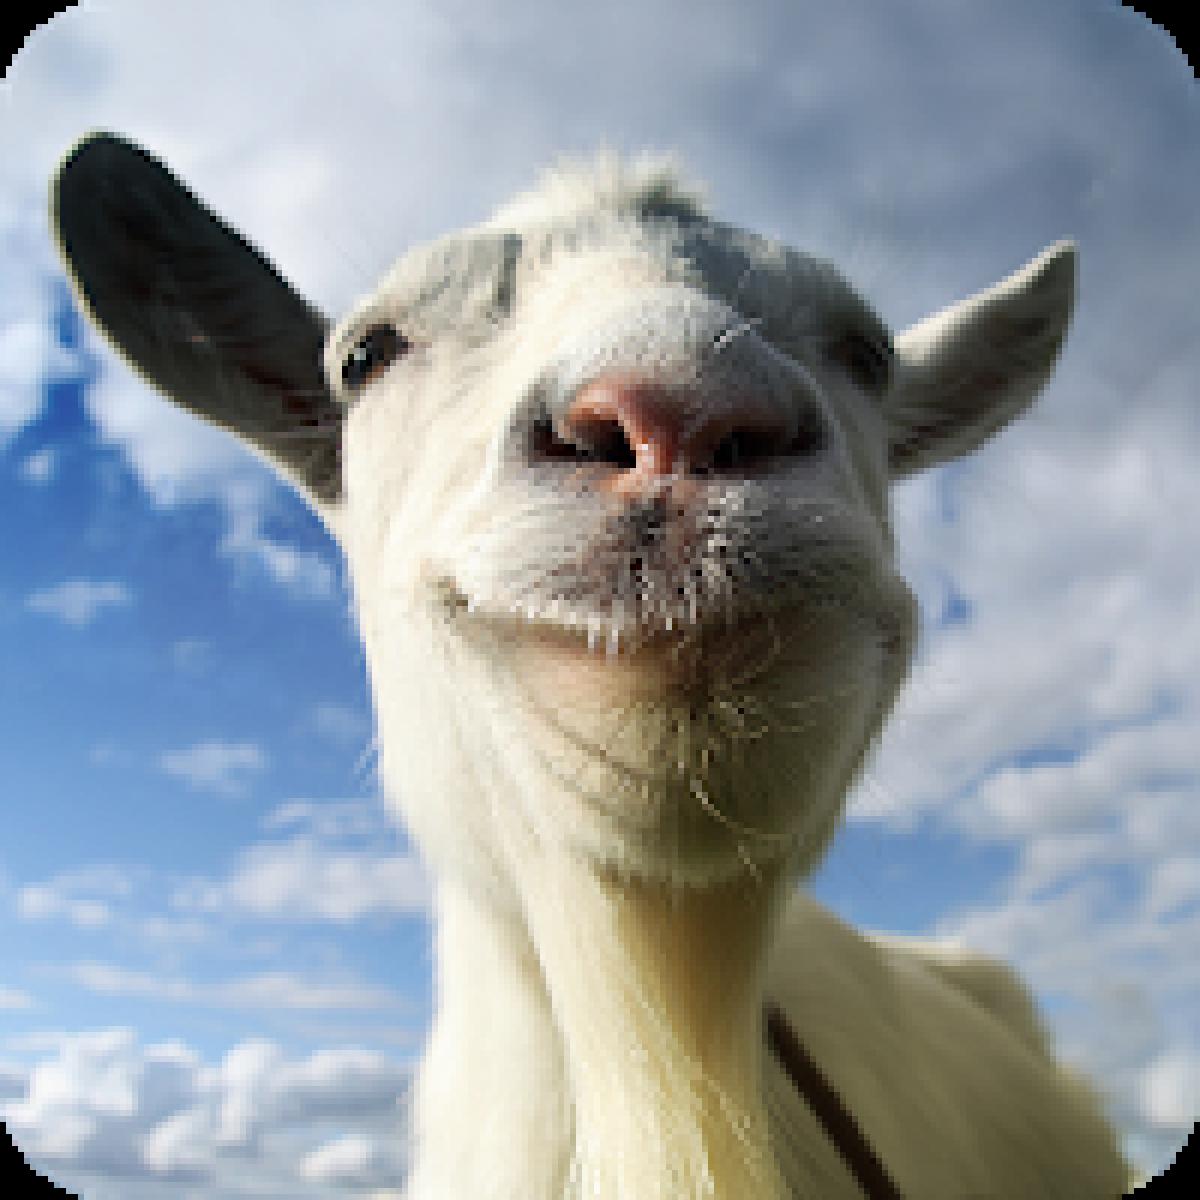 Goat simulator apk 1-3 2-4 betting system scarlett kramer bet on your baby